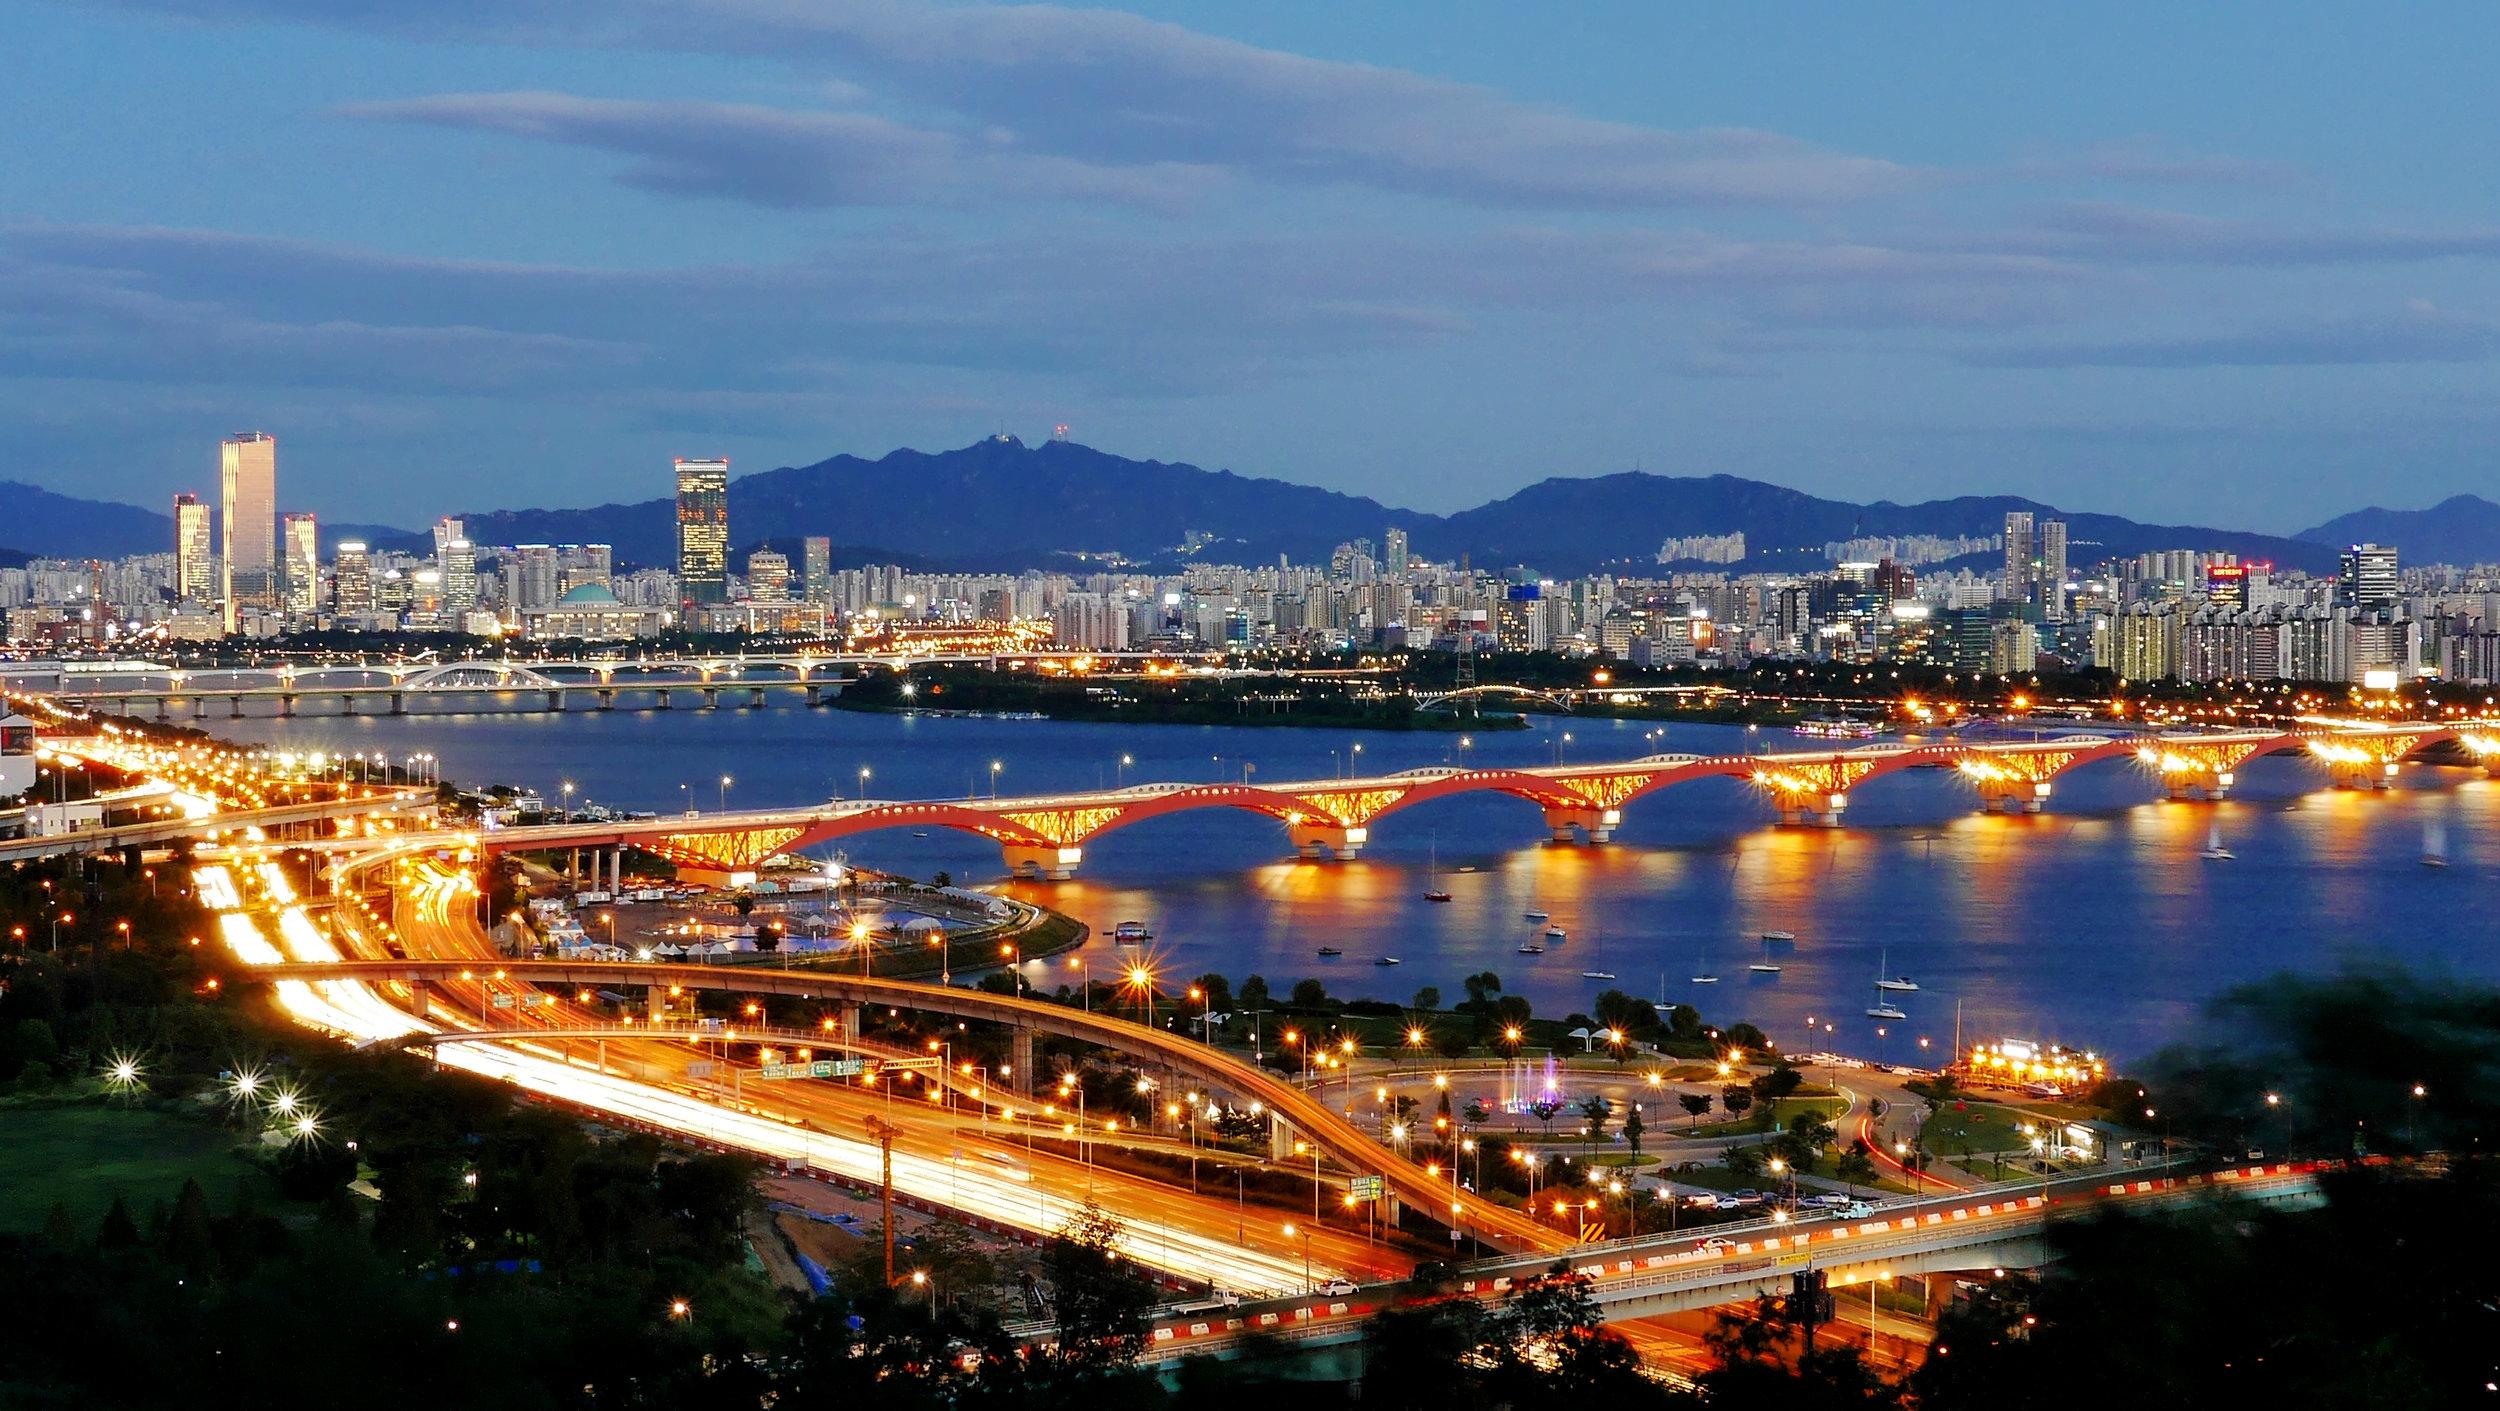 Seoul_at_night.jpg